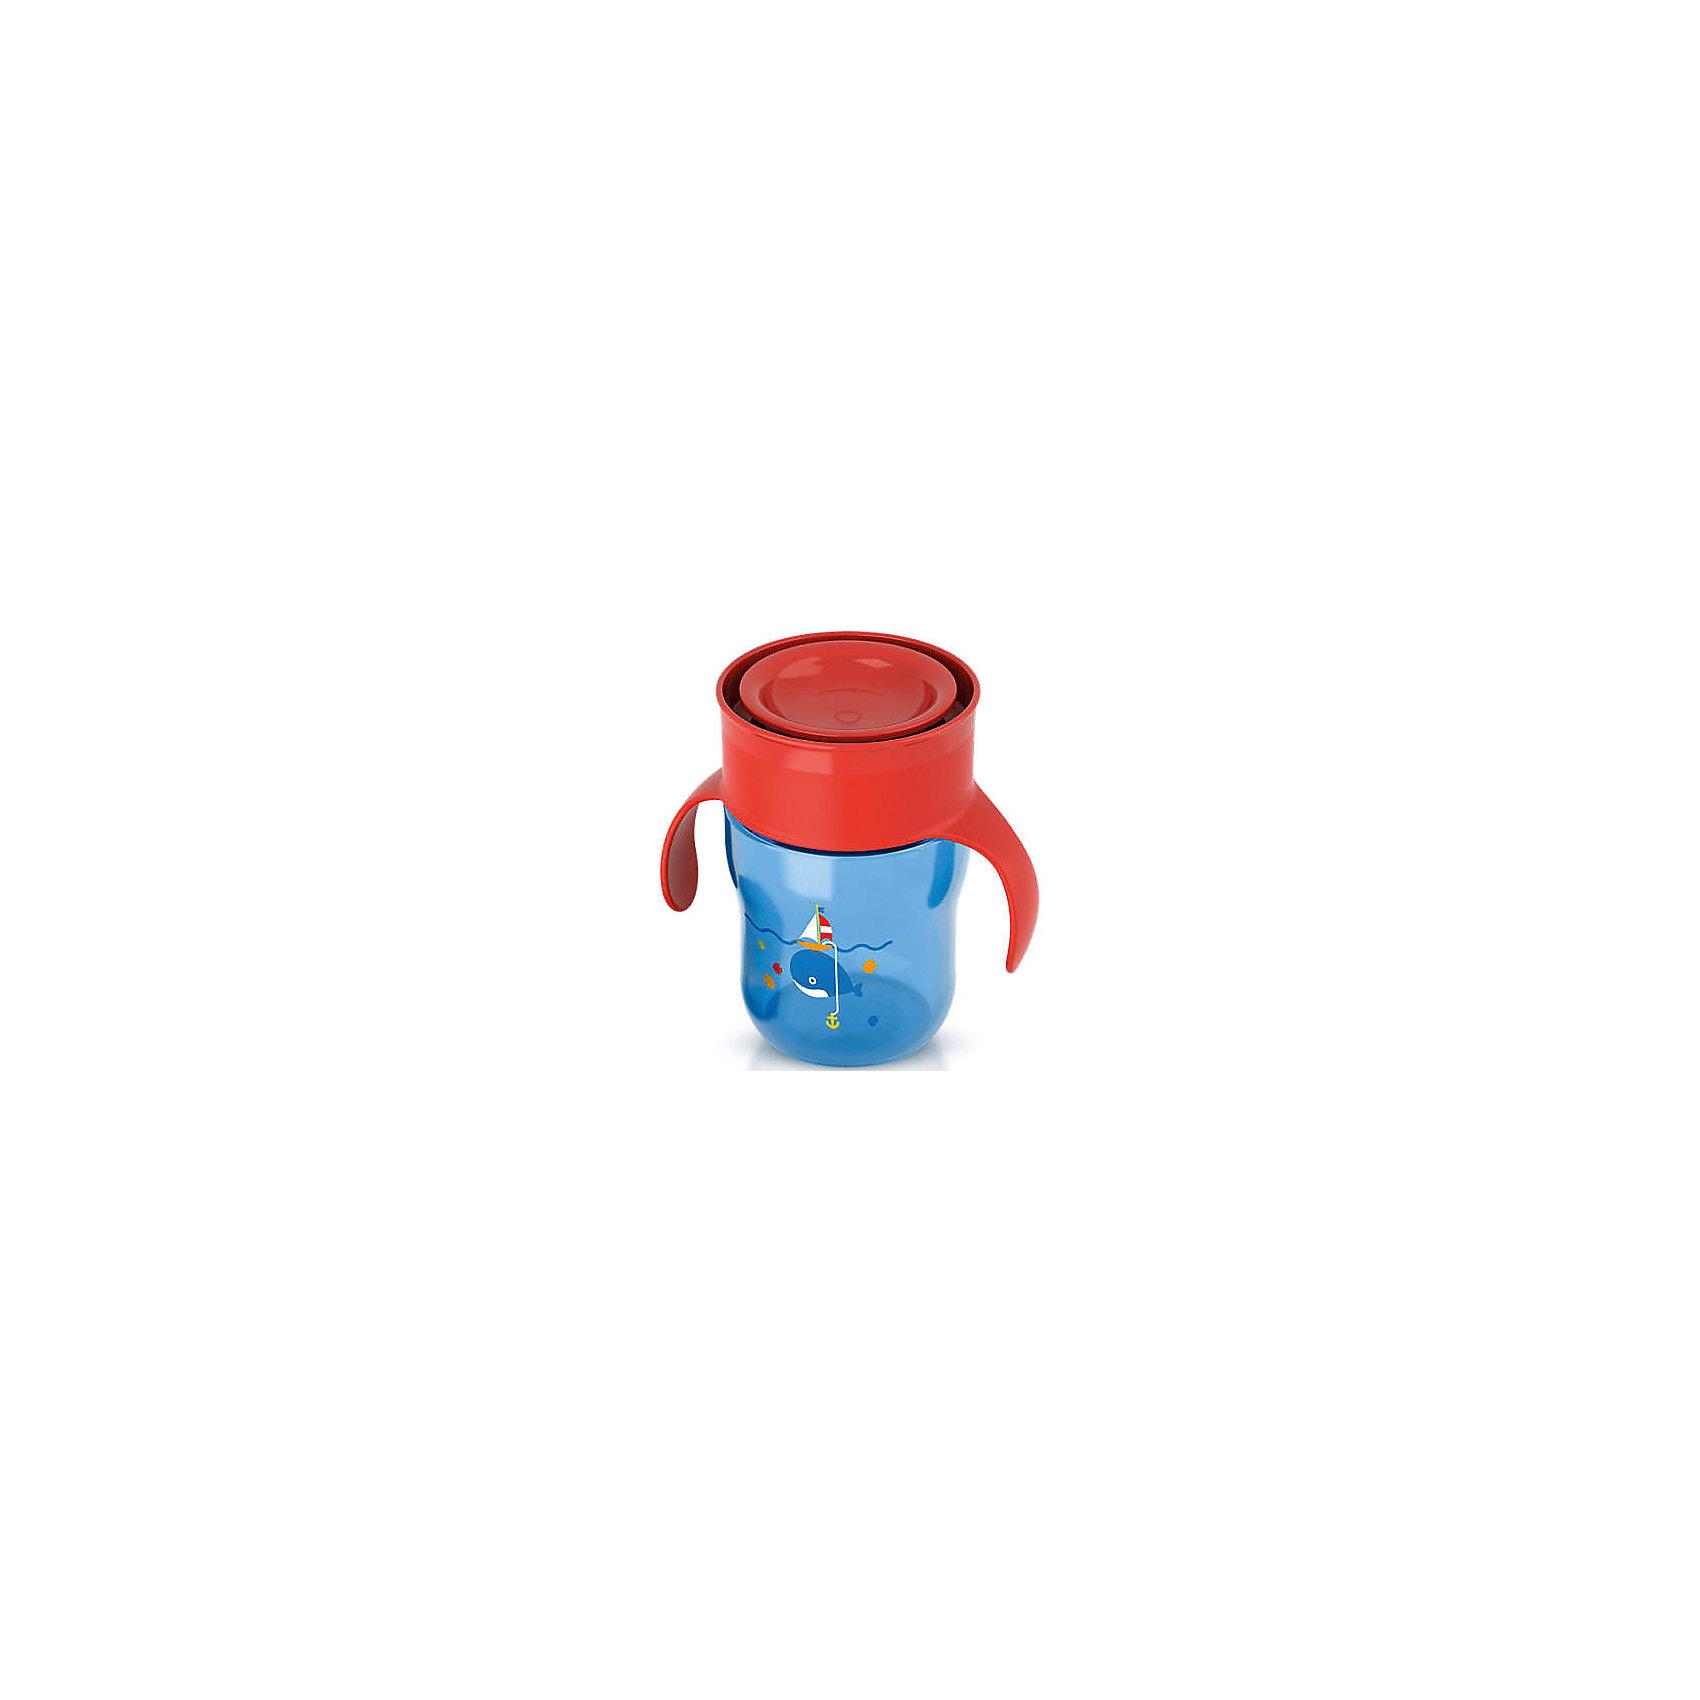 PHILIPS AVENT Чашка-поильник с ручками, с 12 мес., 260 мл., Philips Avent, синий/красный philips avent кружка поильник scf782 с 12 мес